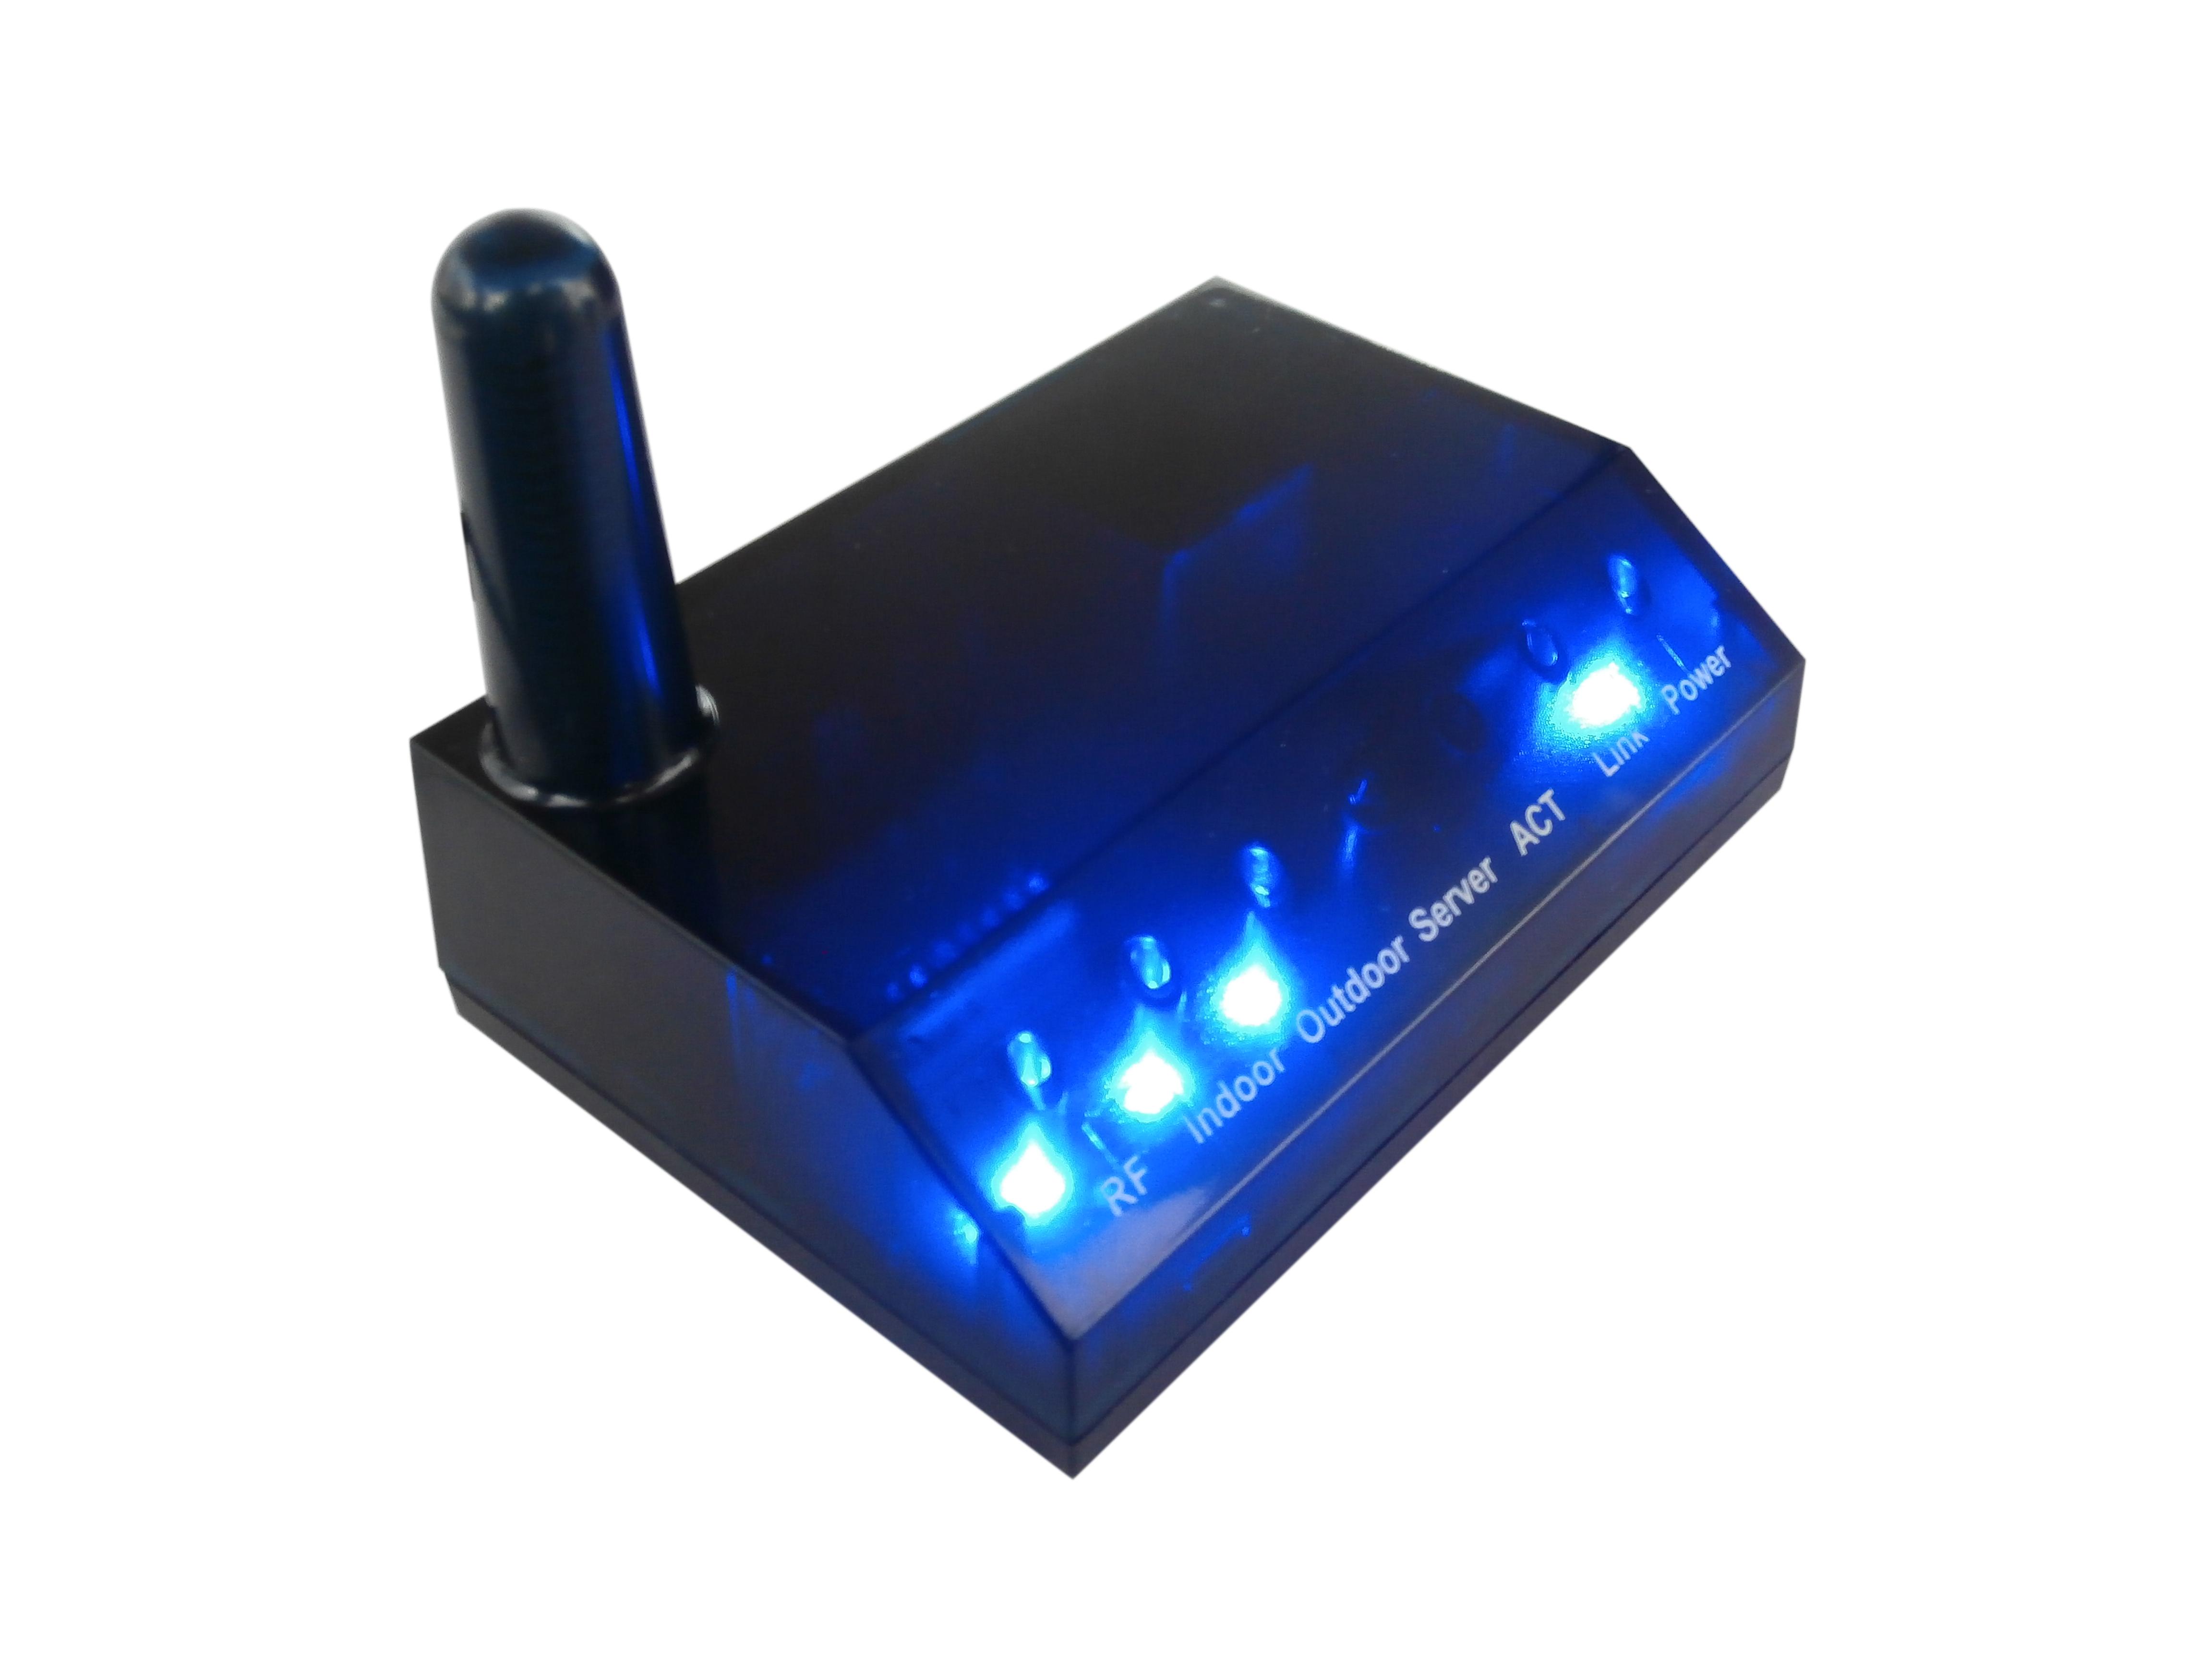 Funk Internet Wetterstation WH2600 SE LAN-Anschluss